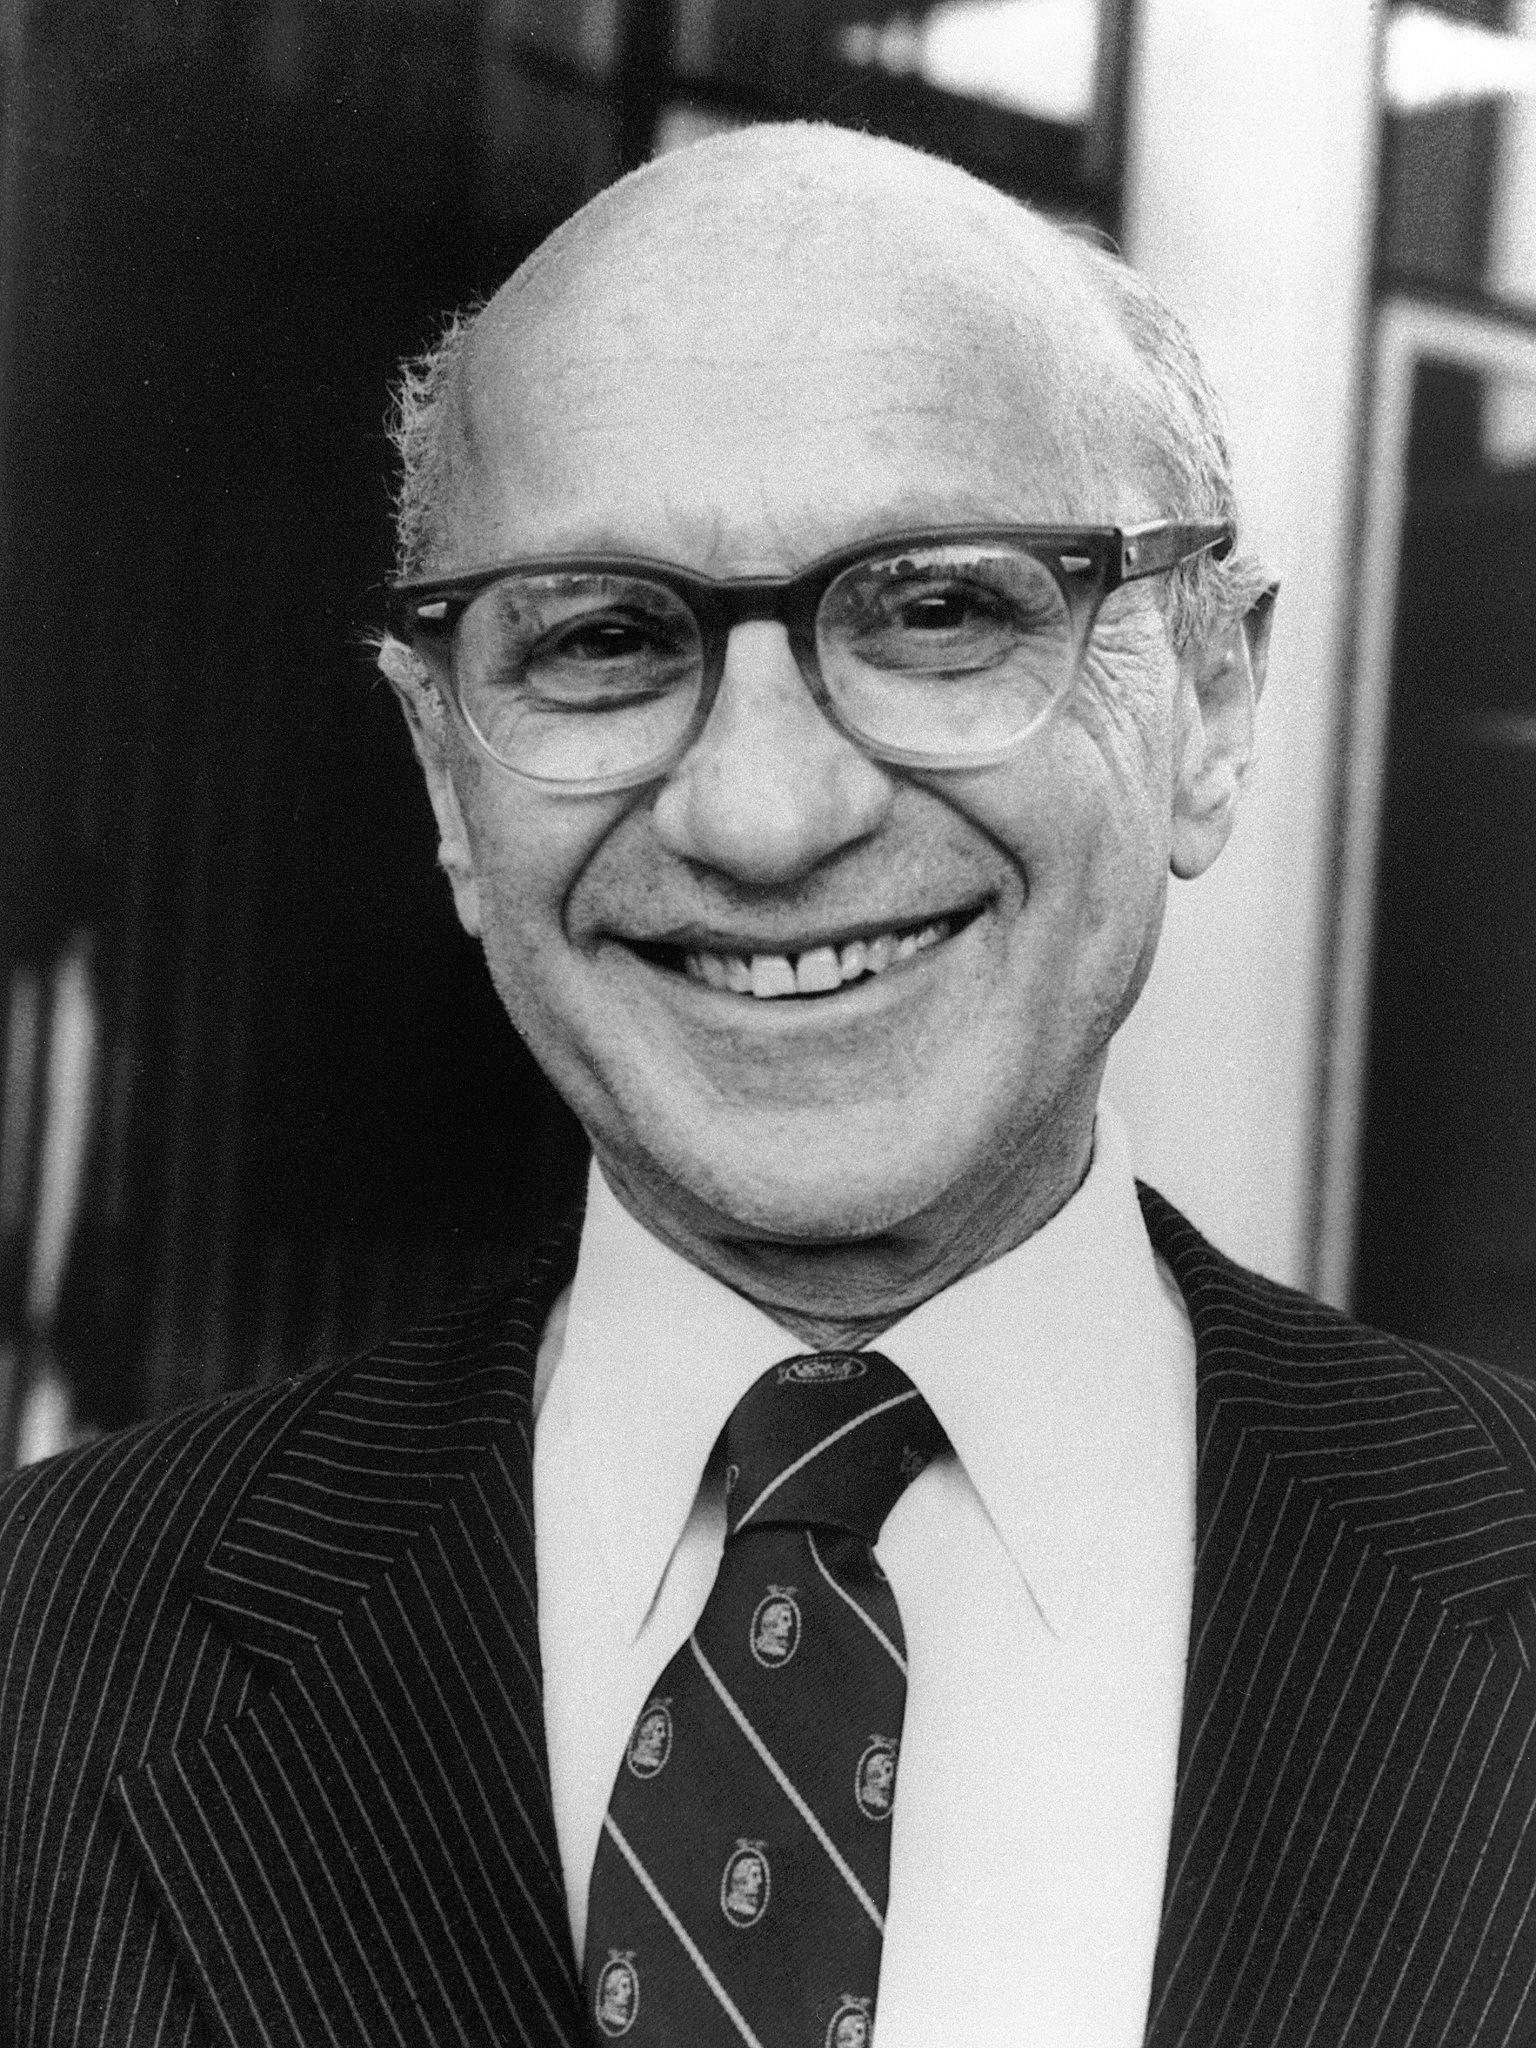 Chi era Milton Friedman